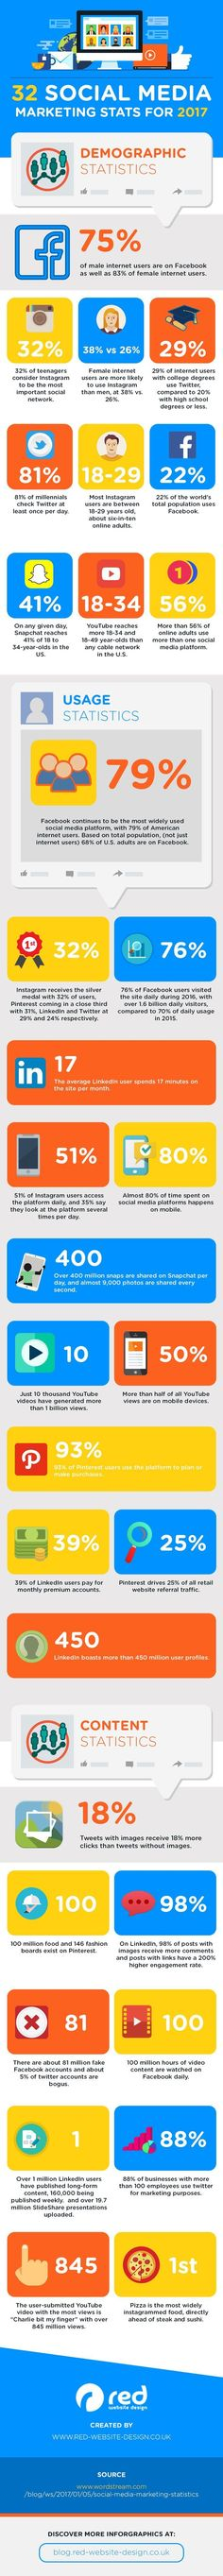 30+ Essential Social Media Marketing Statistics for 2017